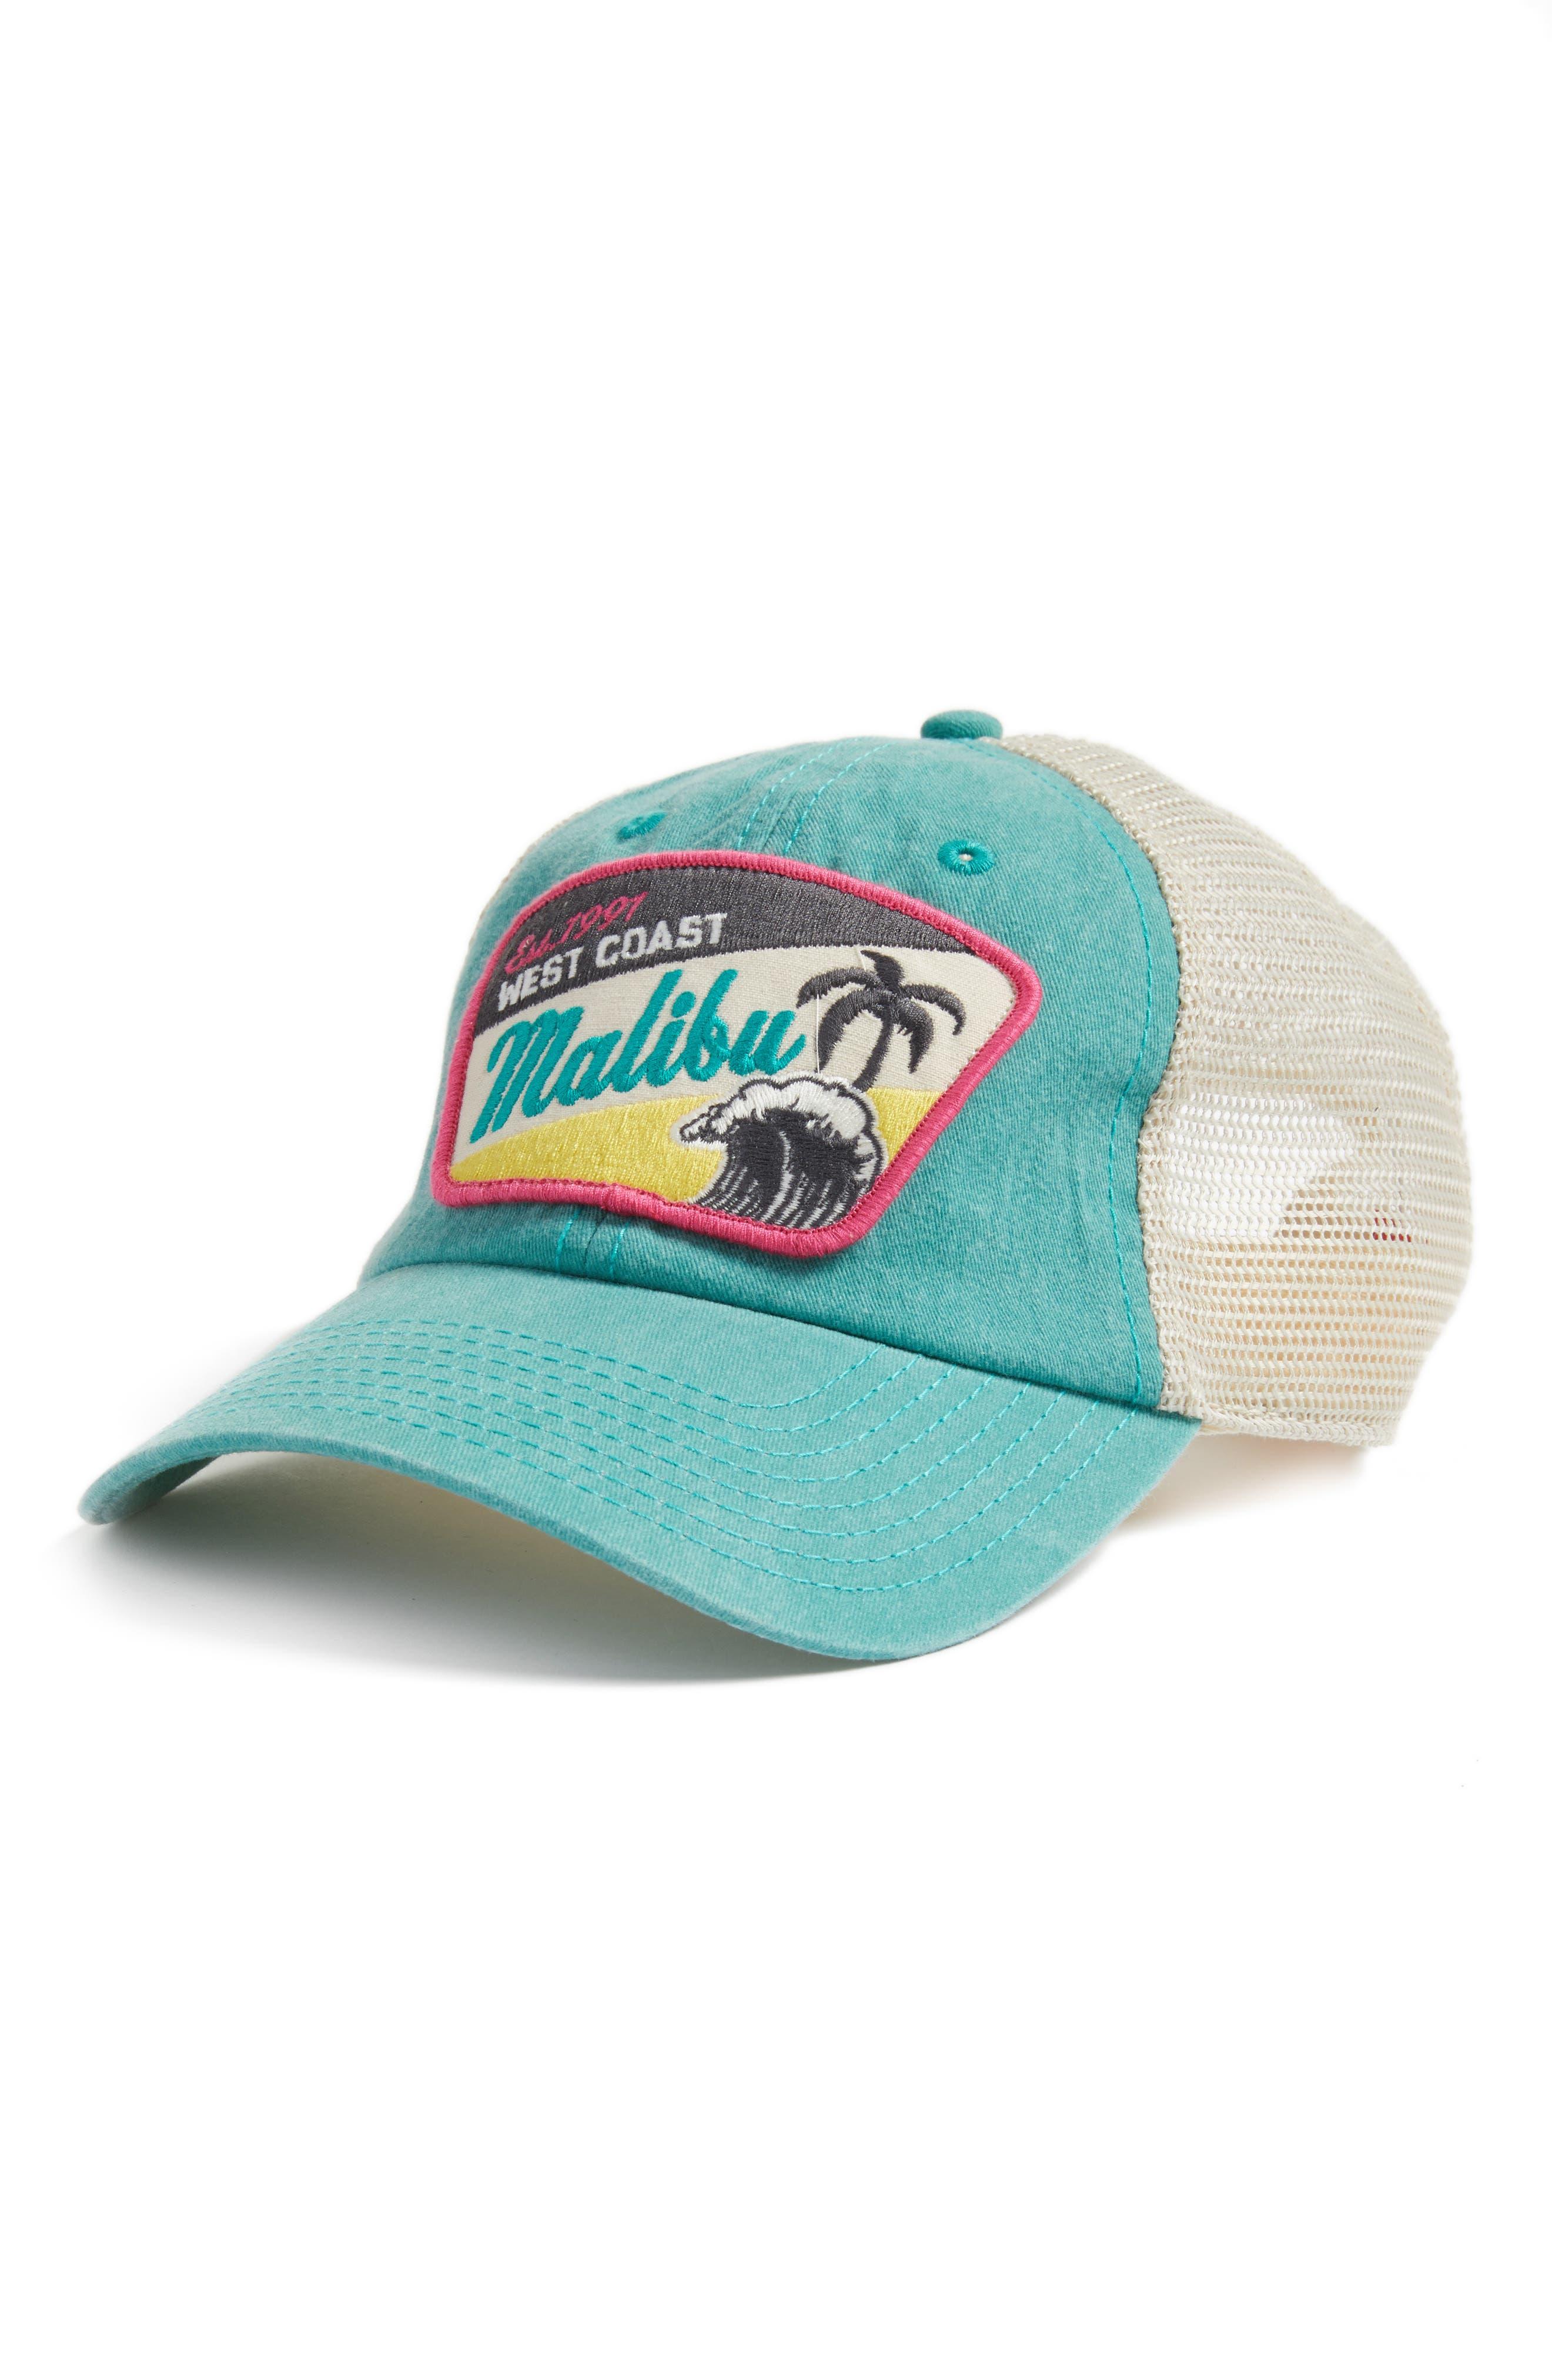 Main Image - American Needle Ravenswood - Destination Malibu Hat